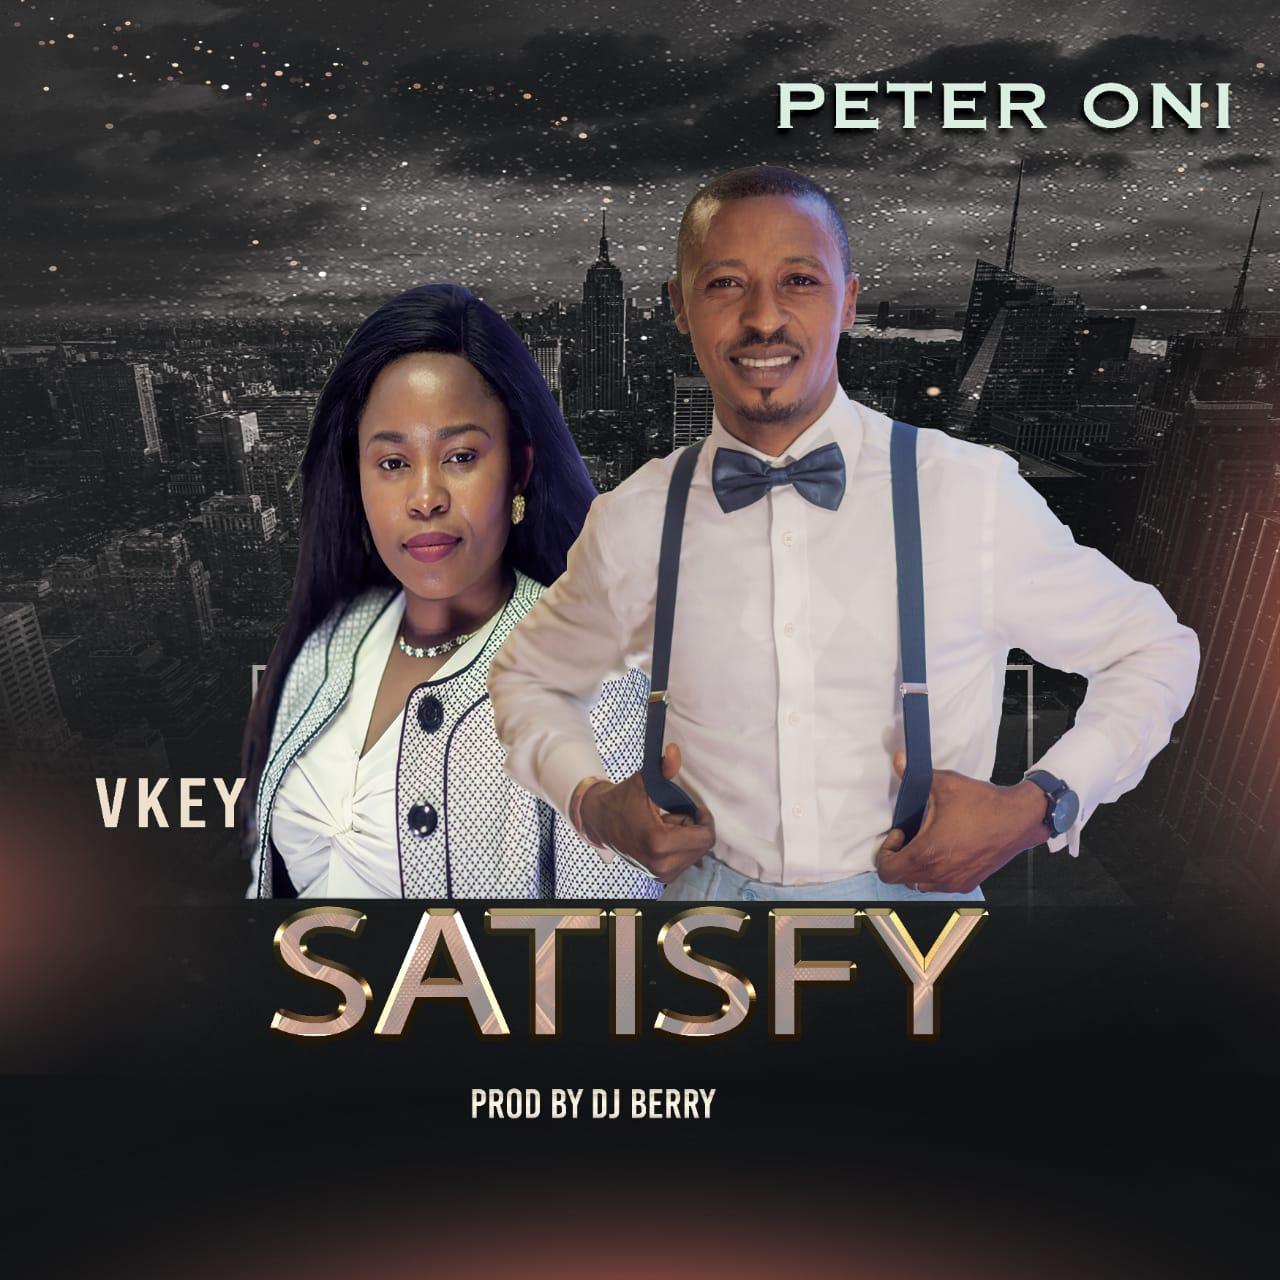 Peter Oni & Vkey - Satisfy